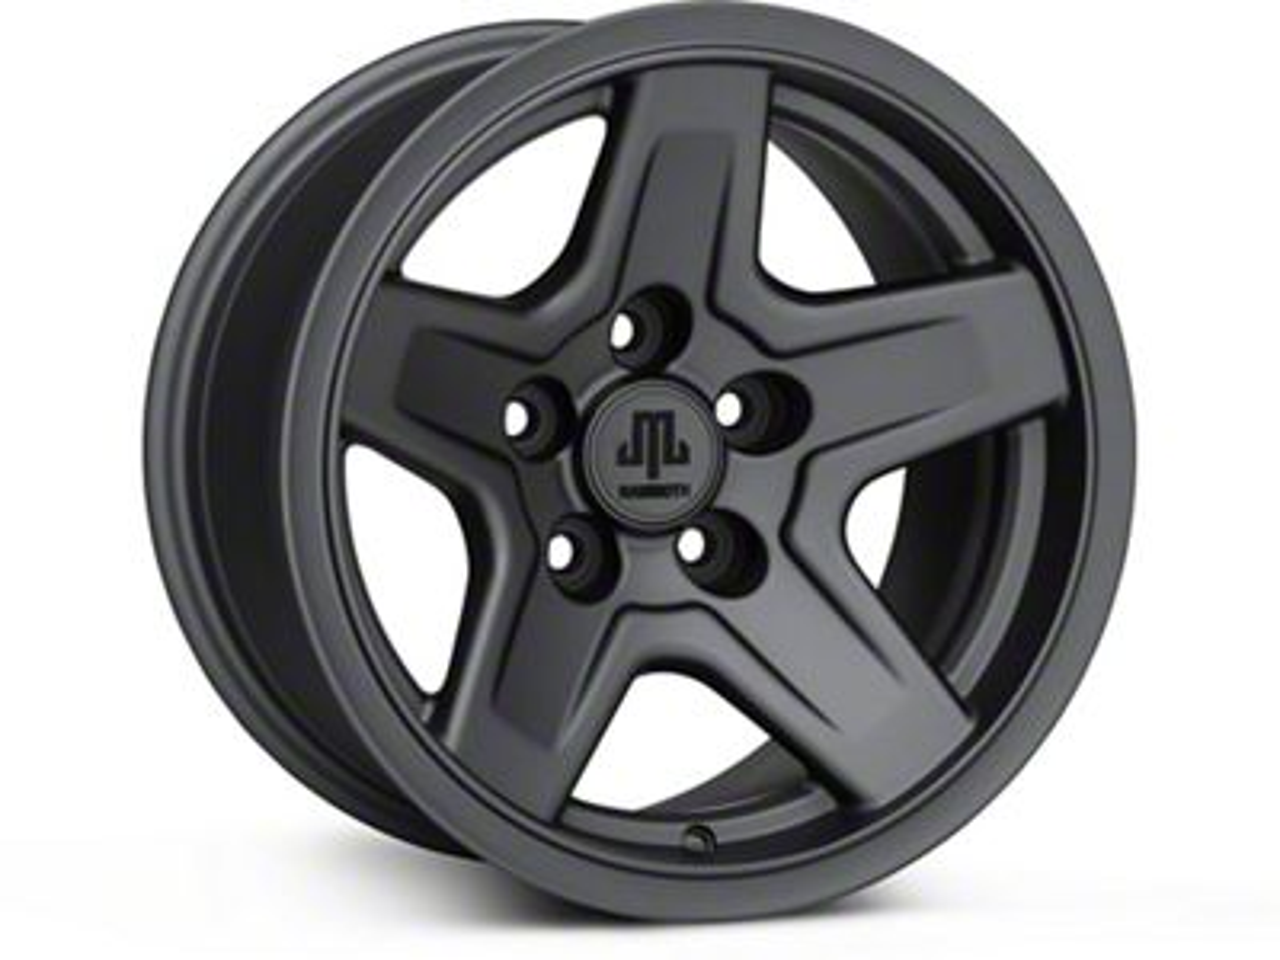 Mammoth Boulder Charcoal 15x8 Wheel & Mickey Thompson Deegan 38 31x10.50R15 Tire Kit (87-06 Jeep Wrangler YJ & TJ)